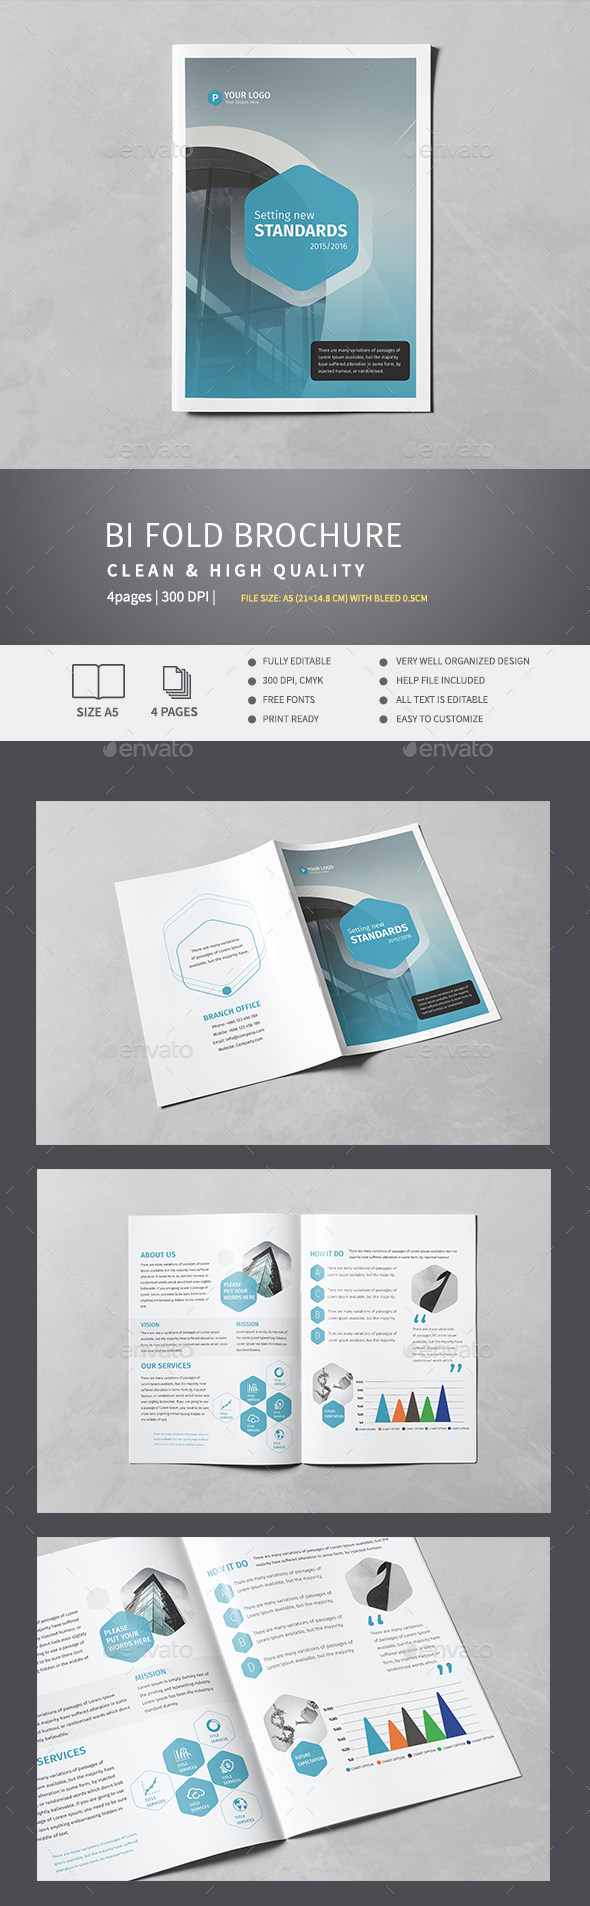 Corporate Bi-Fold Brochure v.4 - Corporate Brochures